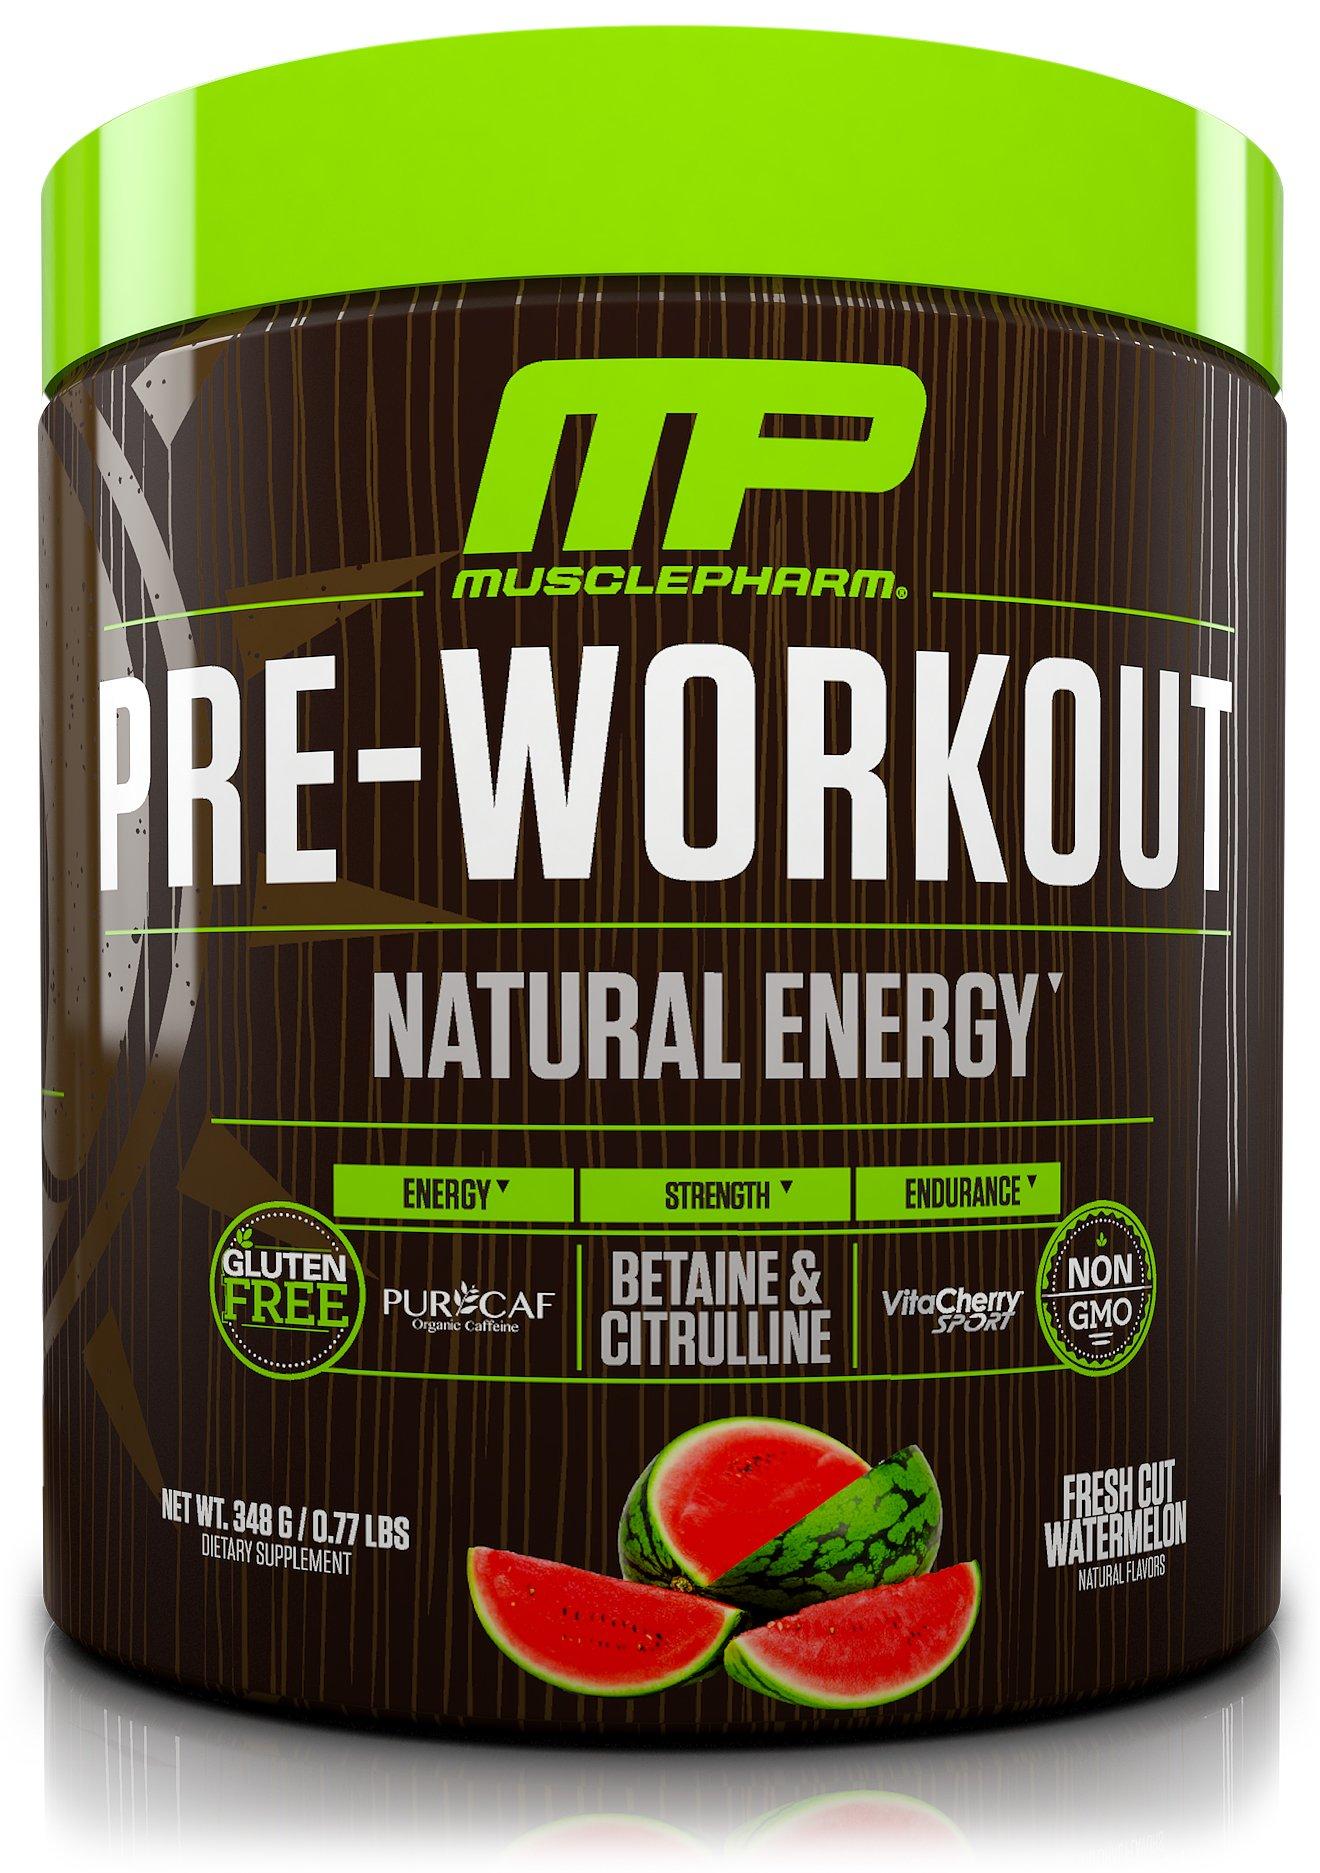 Muscle Pharm Natural Pre Workout Fresh Cut Watermelon, 30 Servings, 0.77LBS/.348g